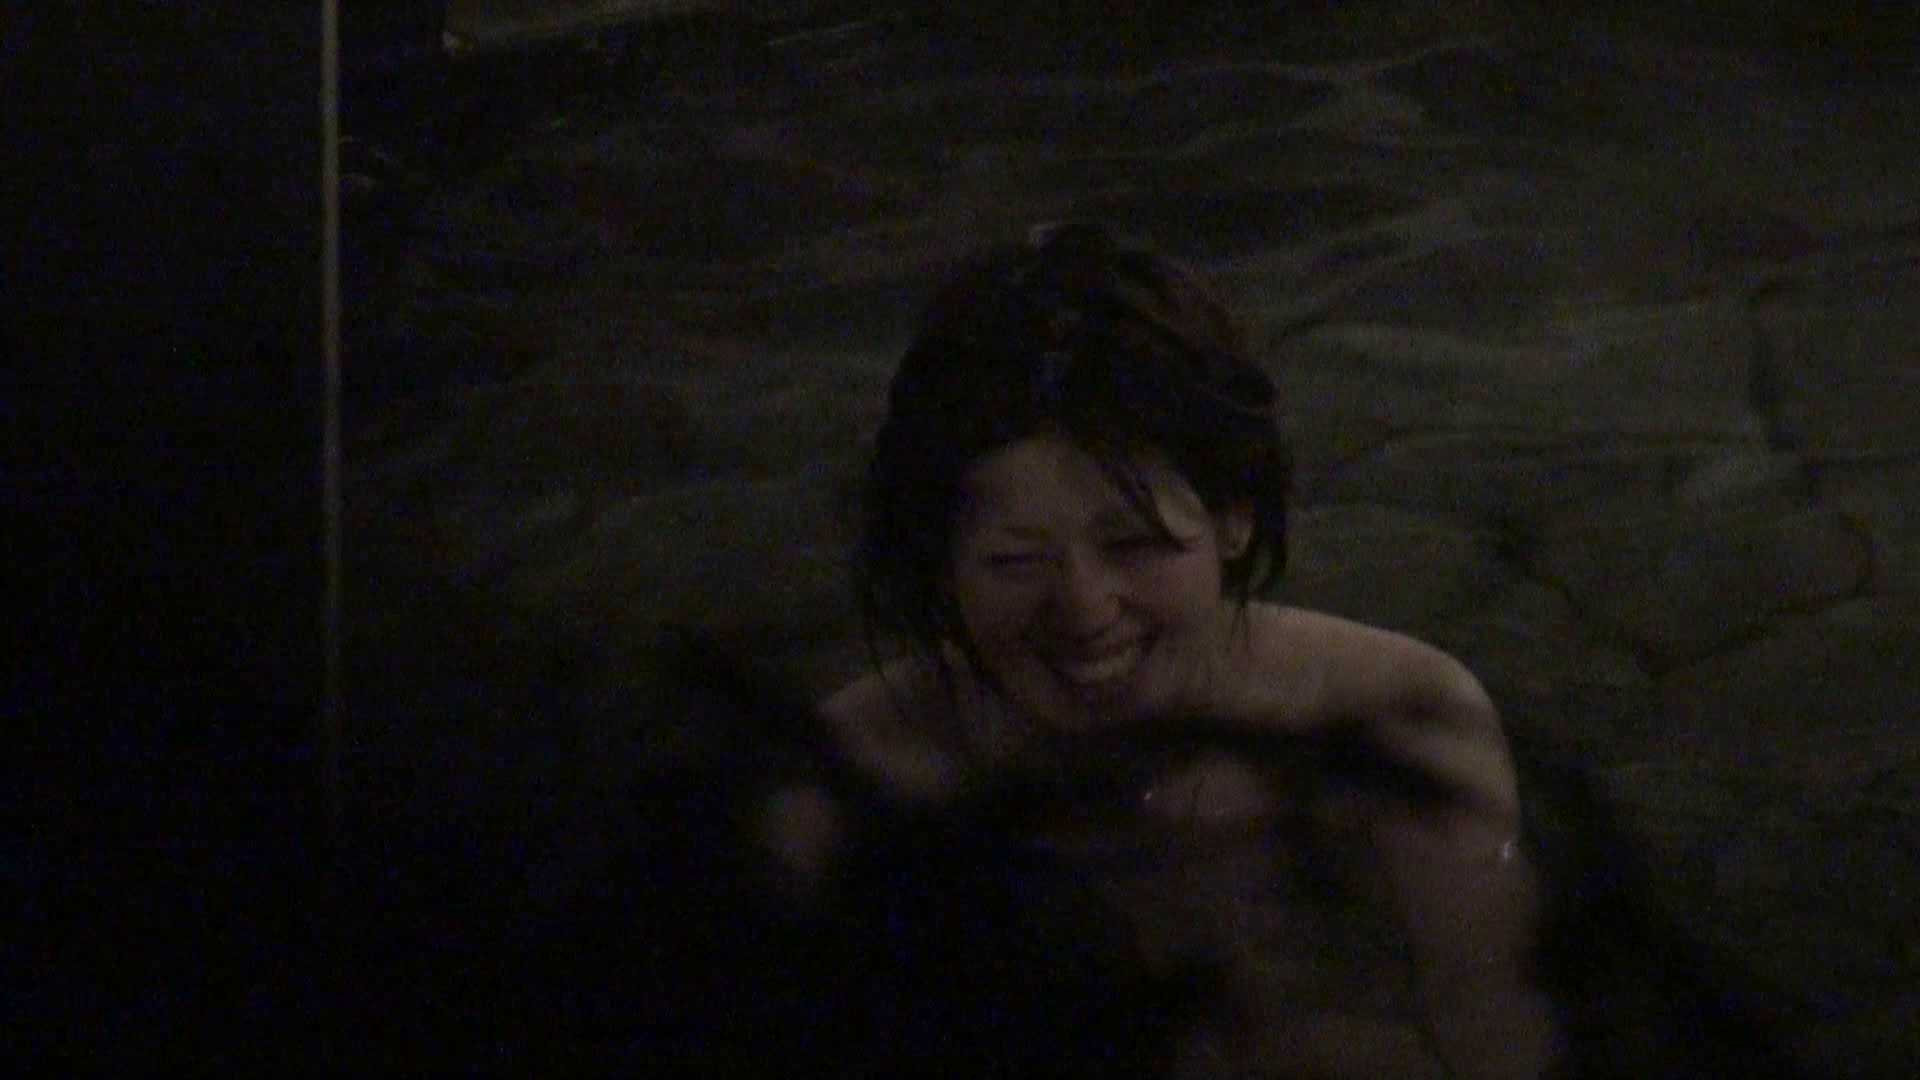 Aquaな露天風呂Vol.376 盗撮 おまんこ動画流出 109連発 32